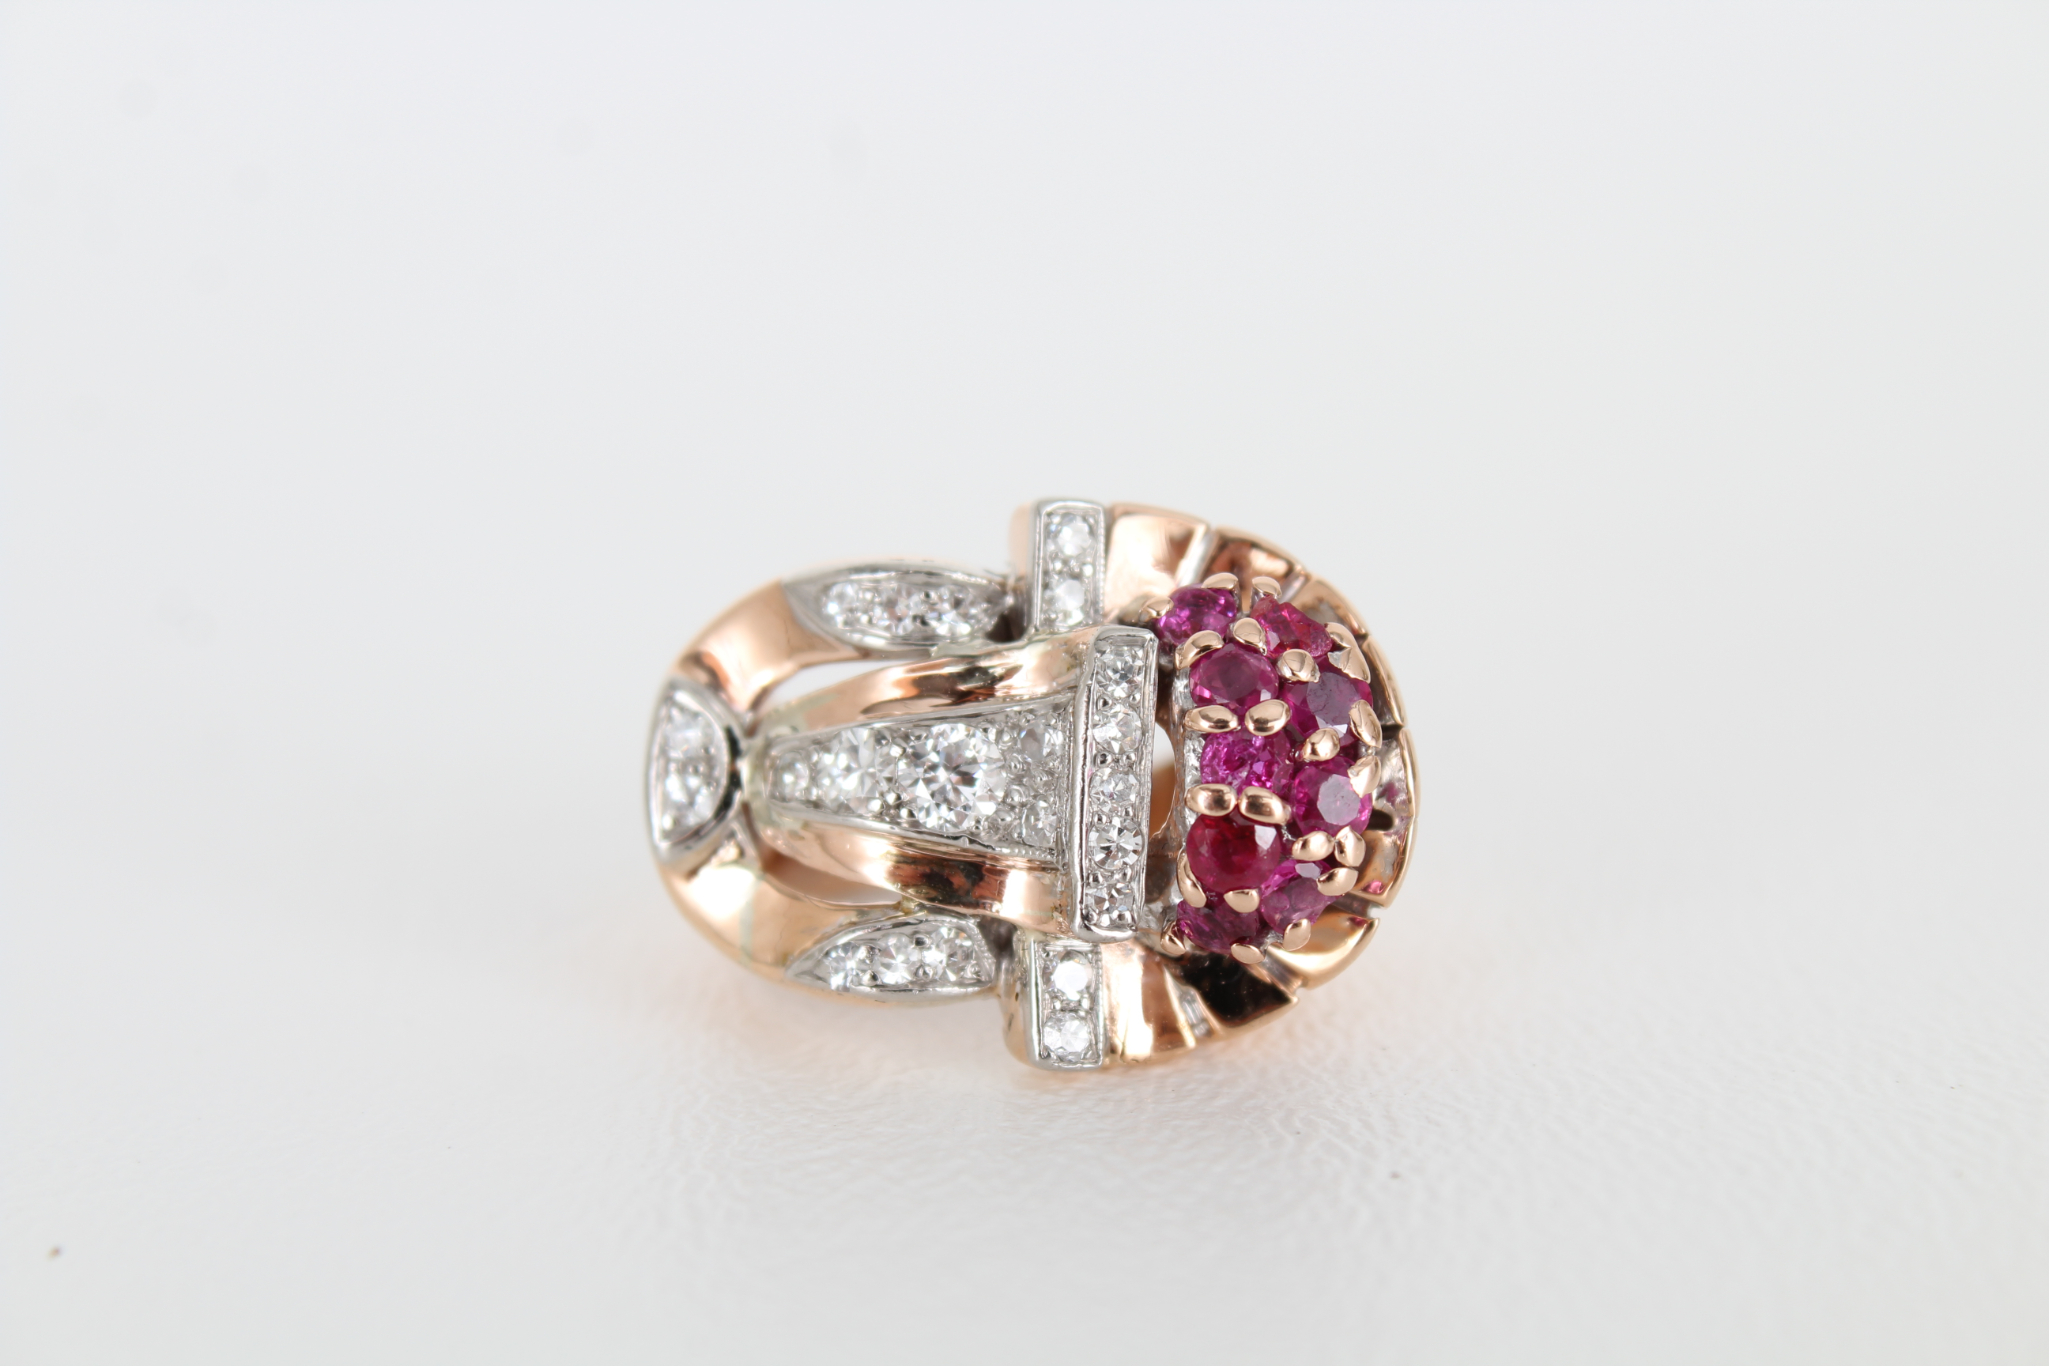 14K Ruby & Diamond Gold Ring - Image 2 of 7